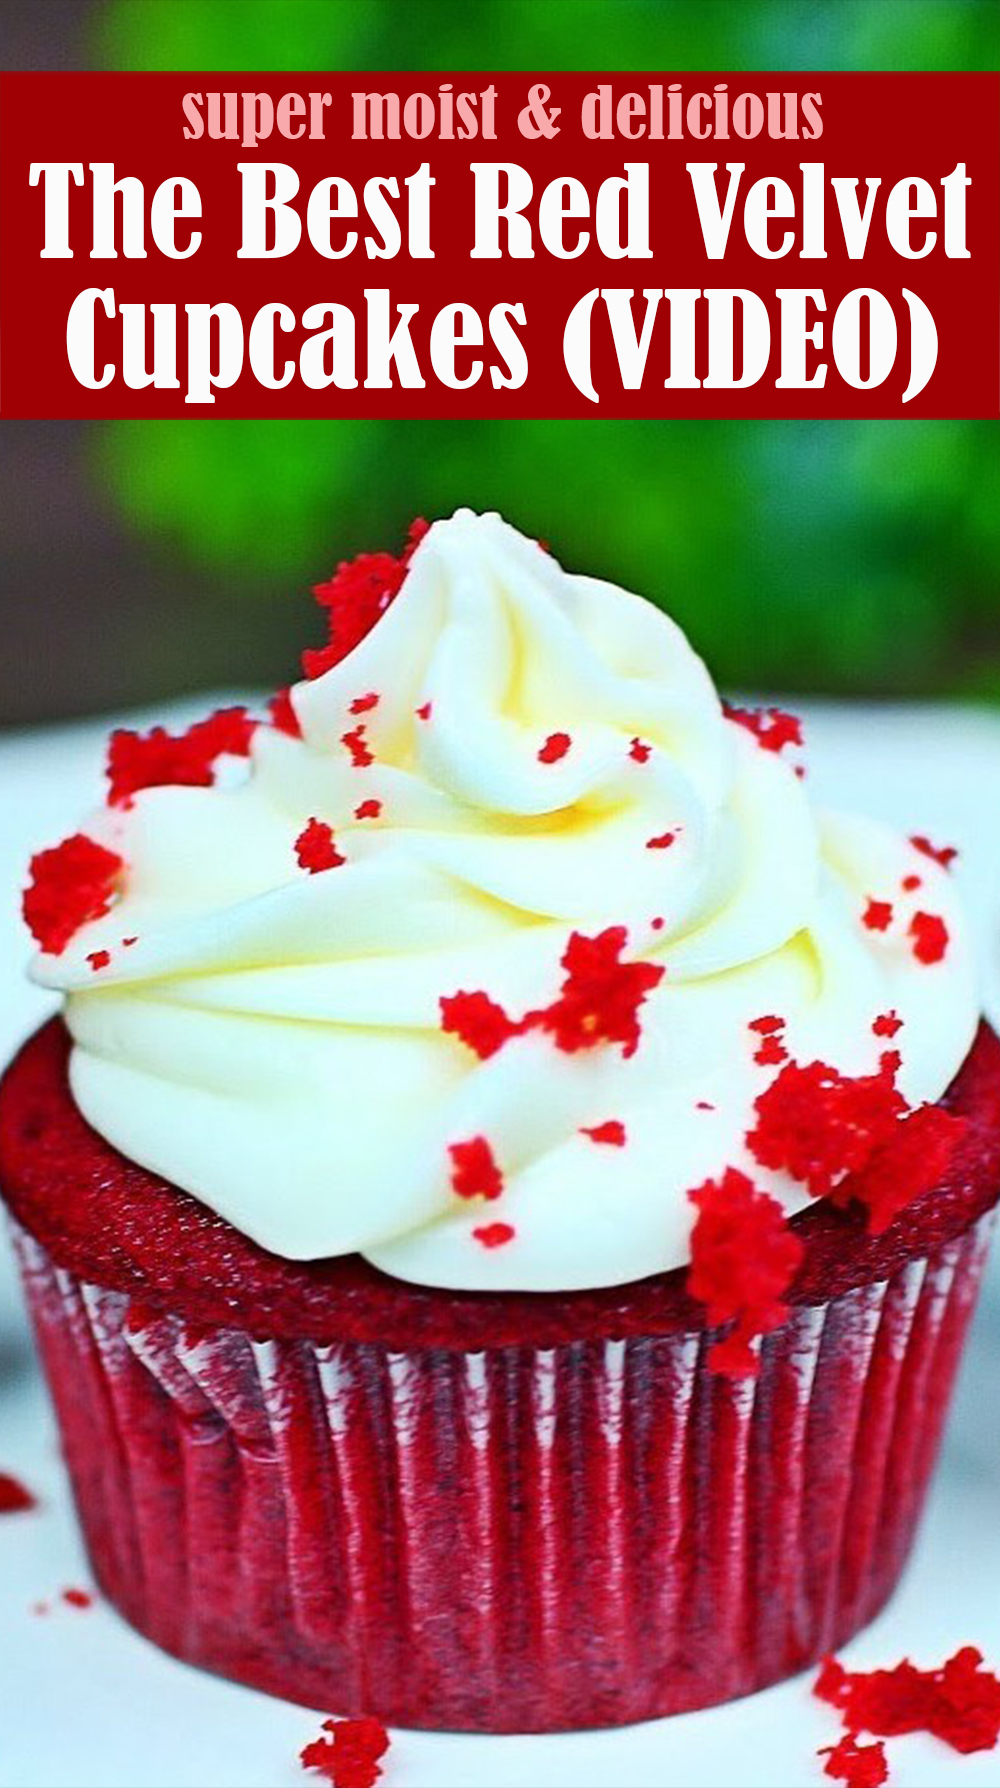 The Best Red Velvet Cupcakes Recipe